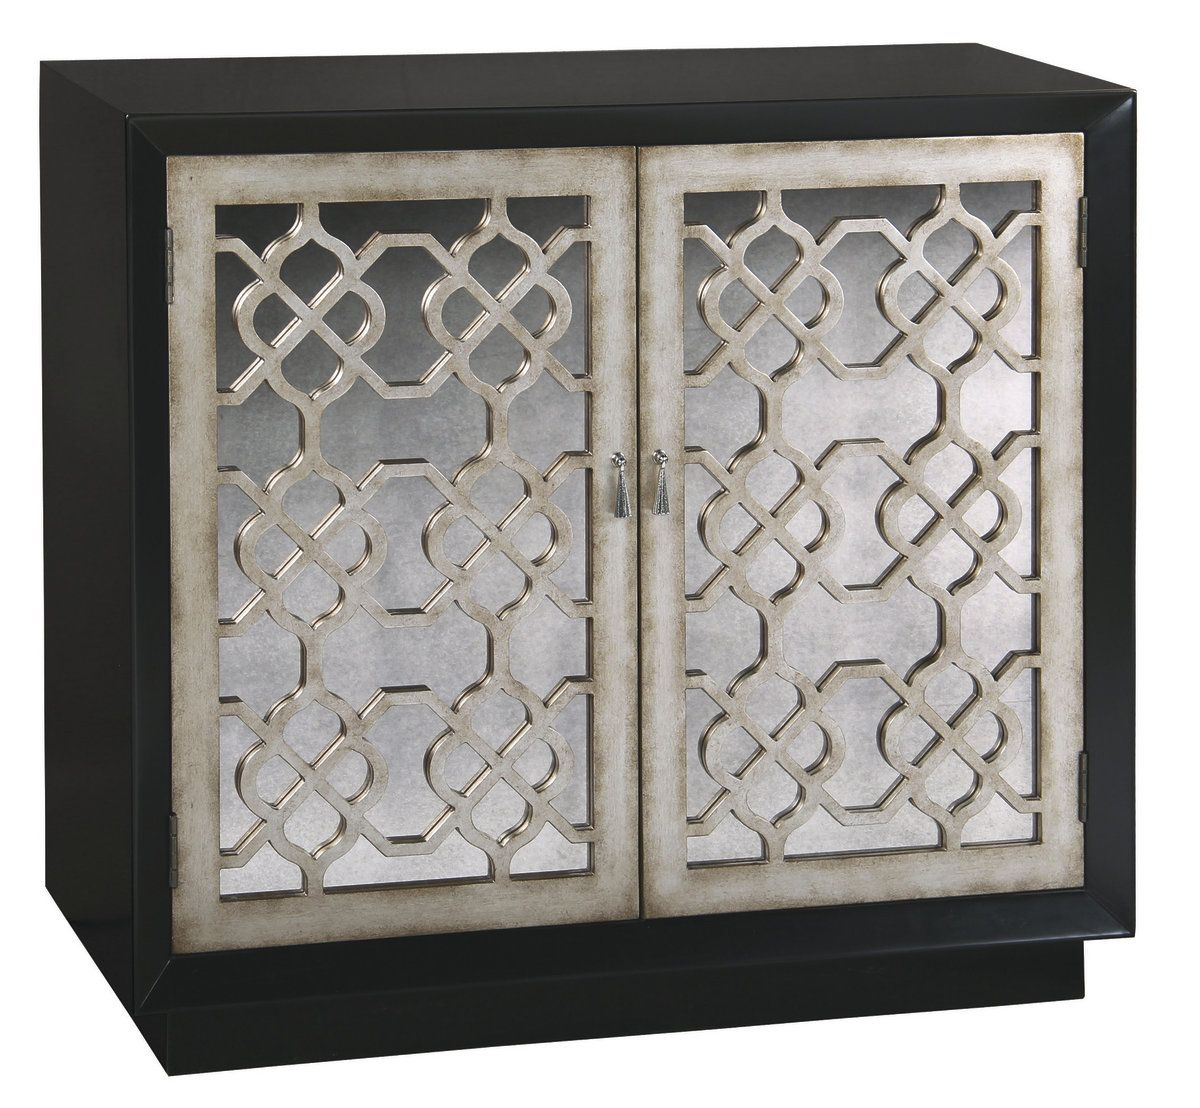 Accentrics   Chests   549052   Hall Chest   Pulaski Furniture   Home  Meridian International 38w